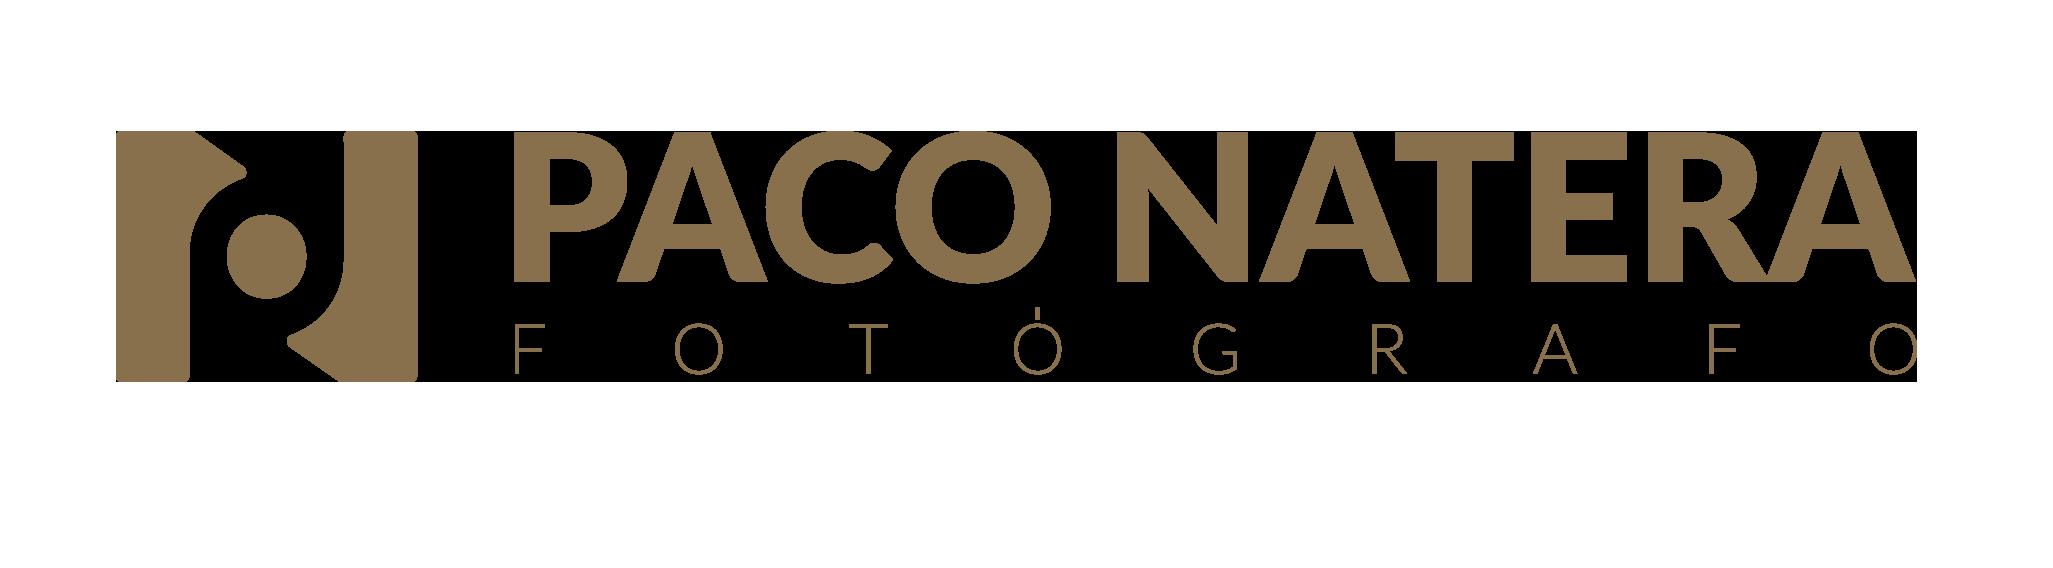 logo-paco-natera_apaisado-2